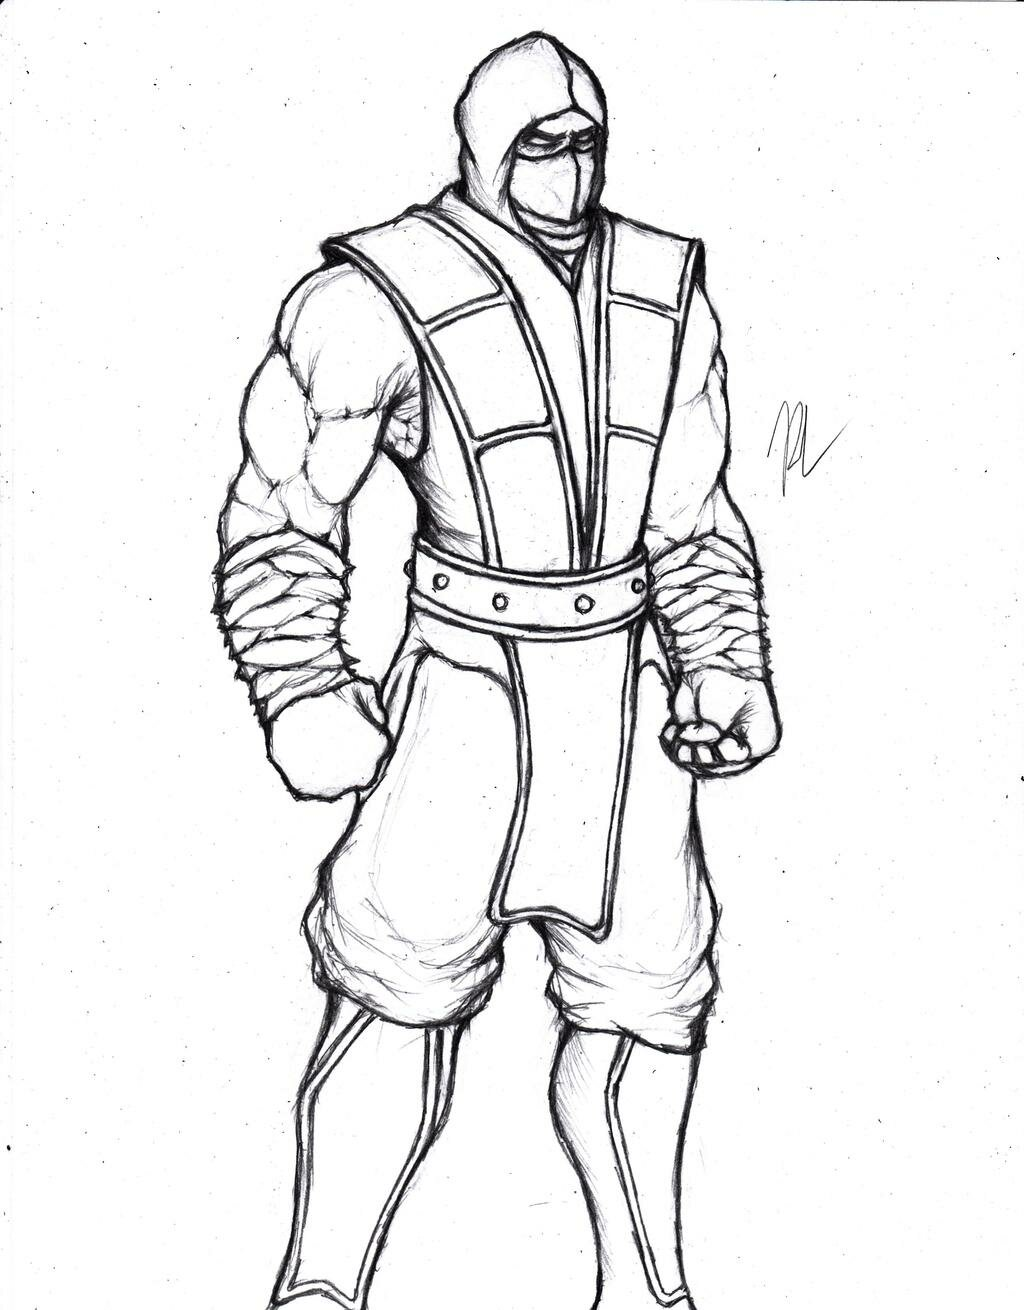 Картинки персонажей из игр карандашом